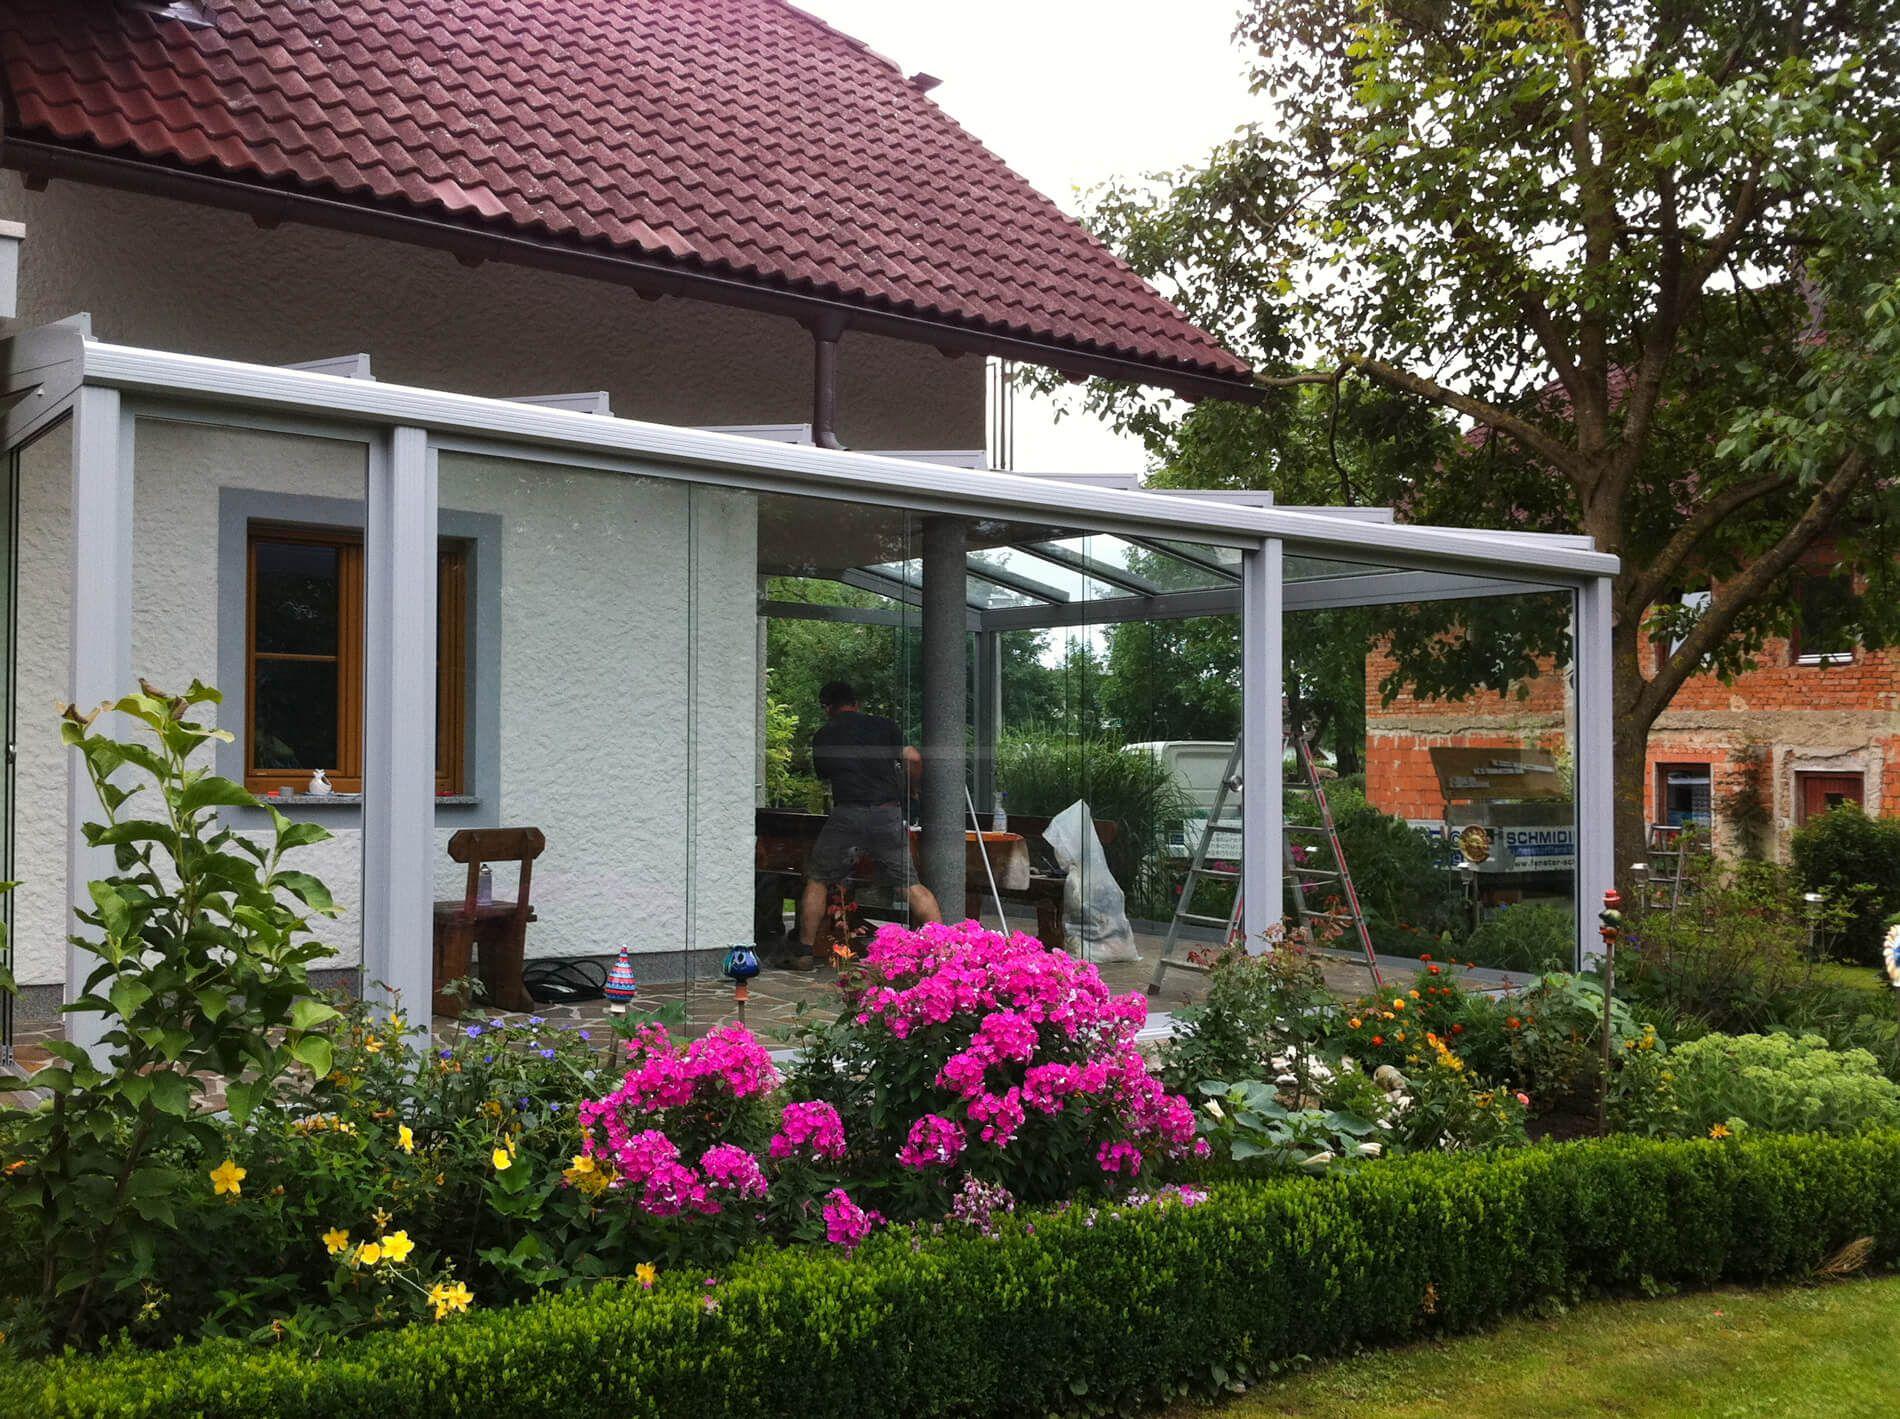 faltt ren terrasse idealer wetterschutz f r den. Black Bedroom Furniture Sets. Home Design Ideas